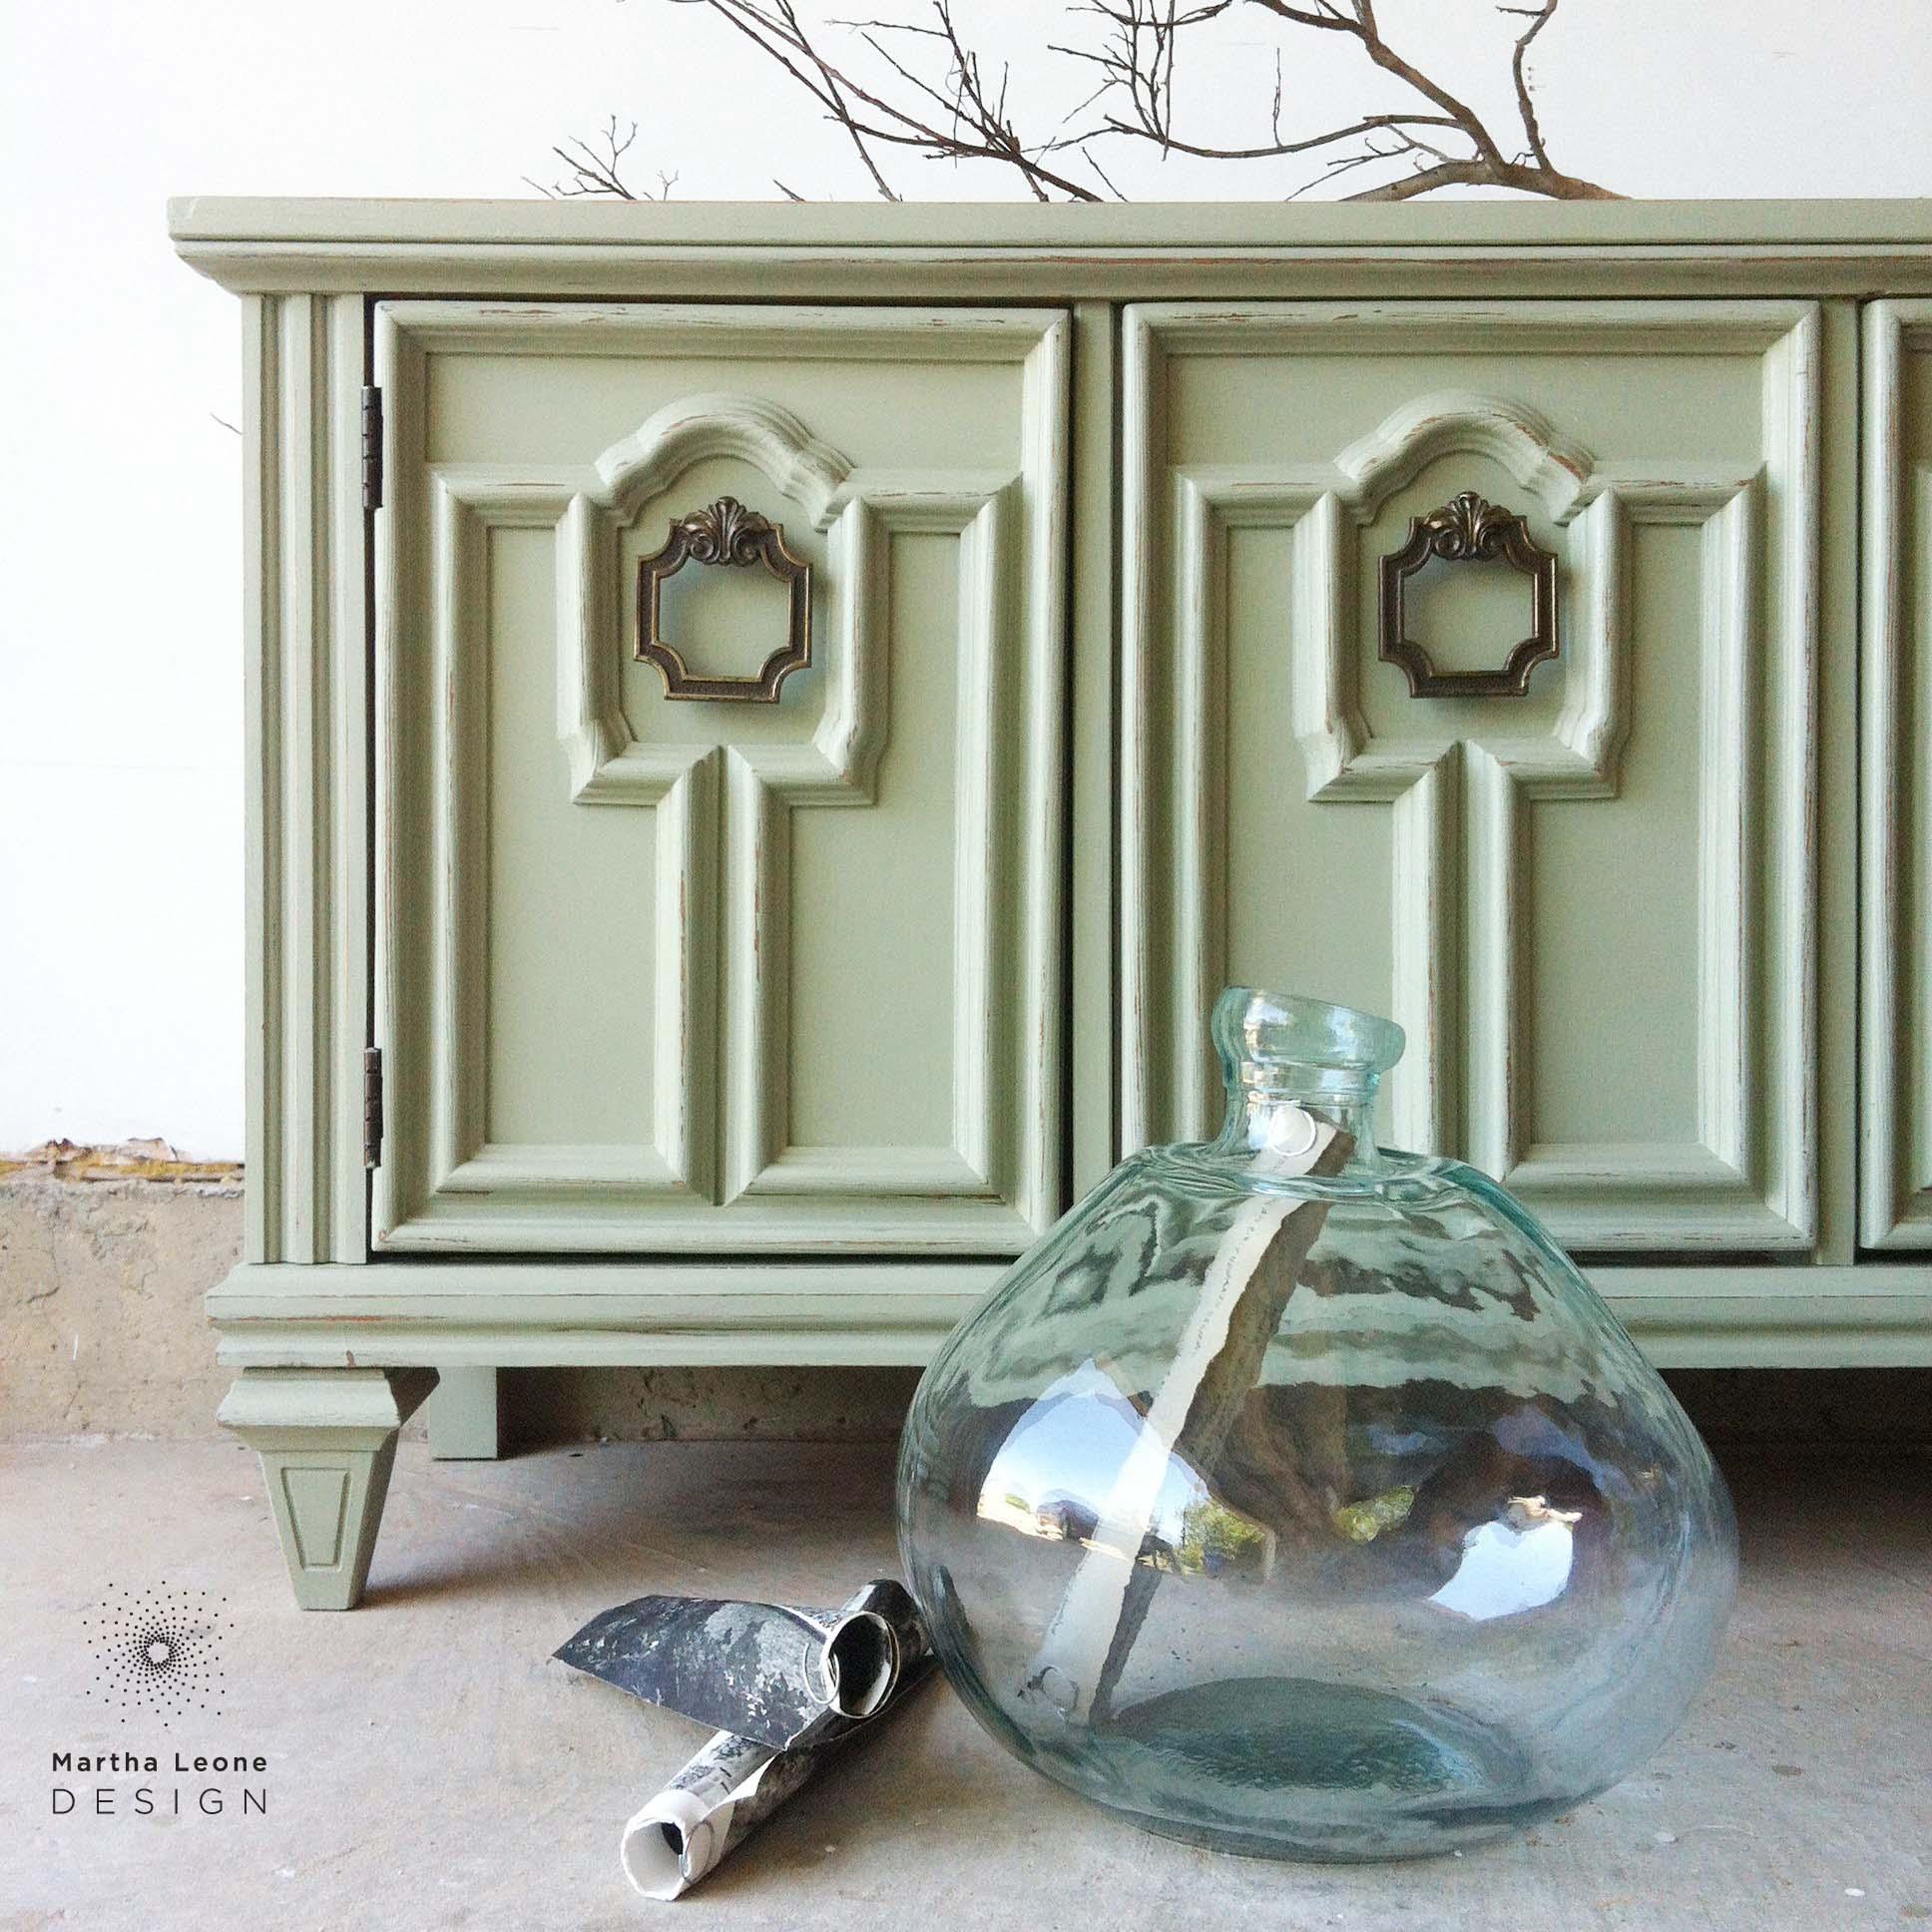 Green Cabinet Martha Leone Design.jpg